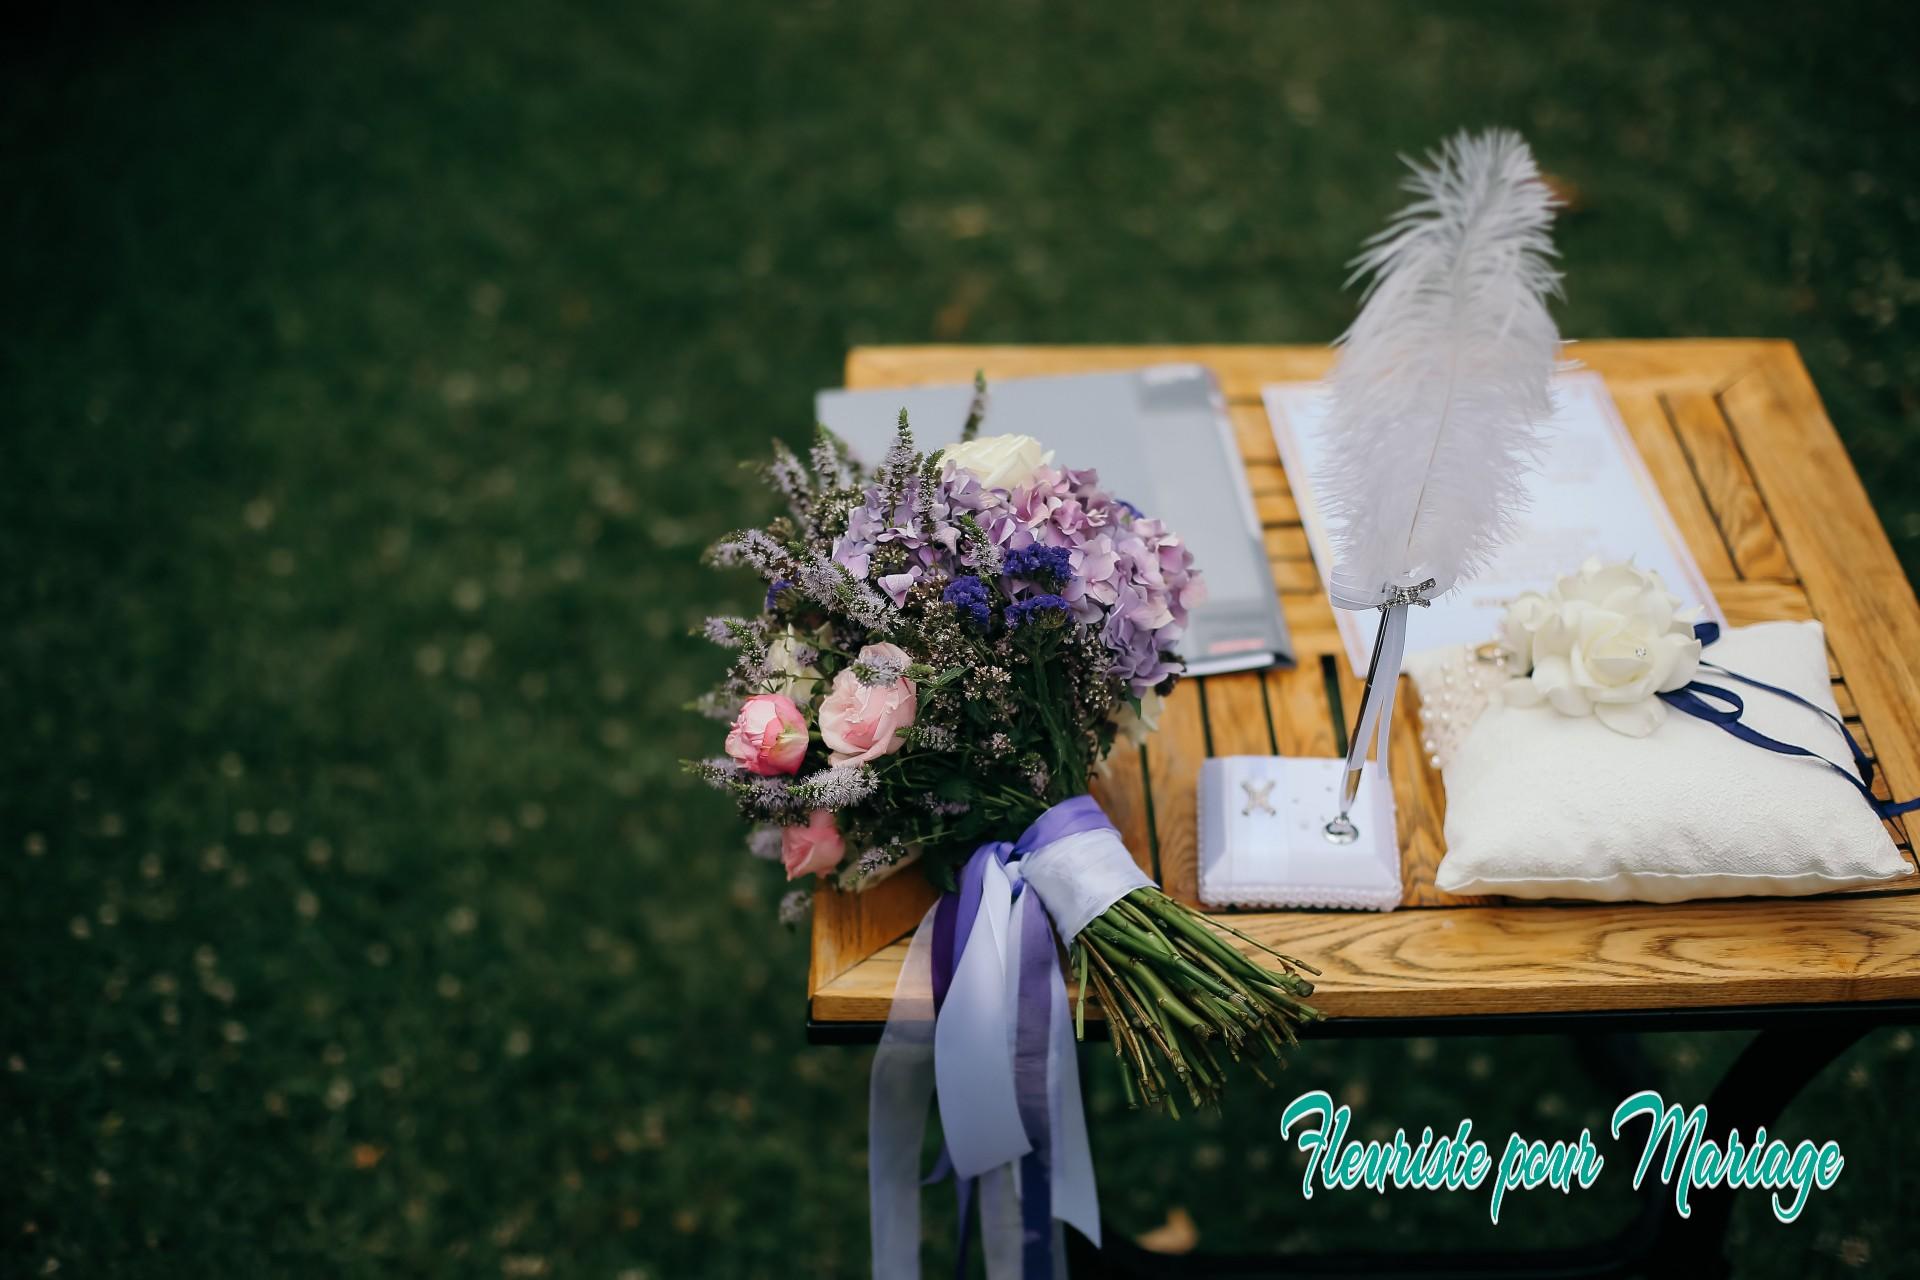 COUSSIN POUR ALLIANGE MARIAGE